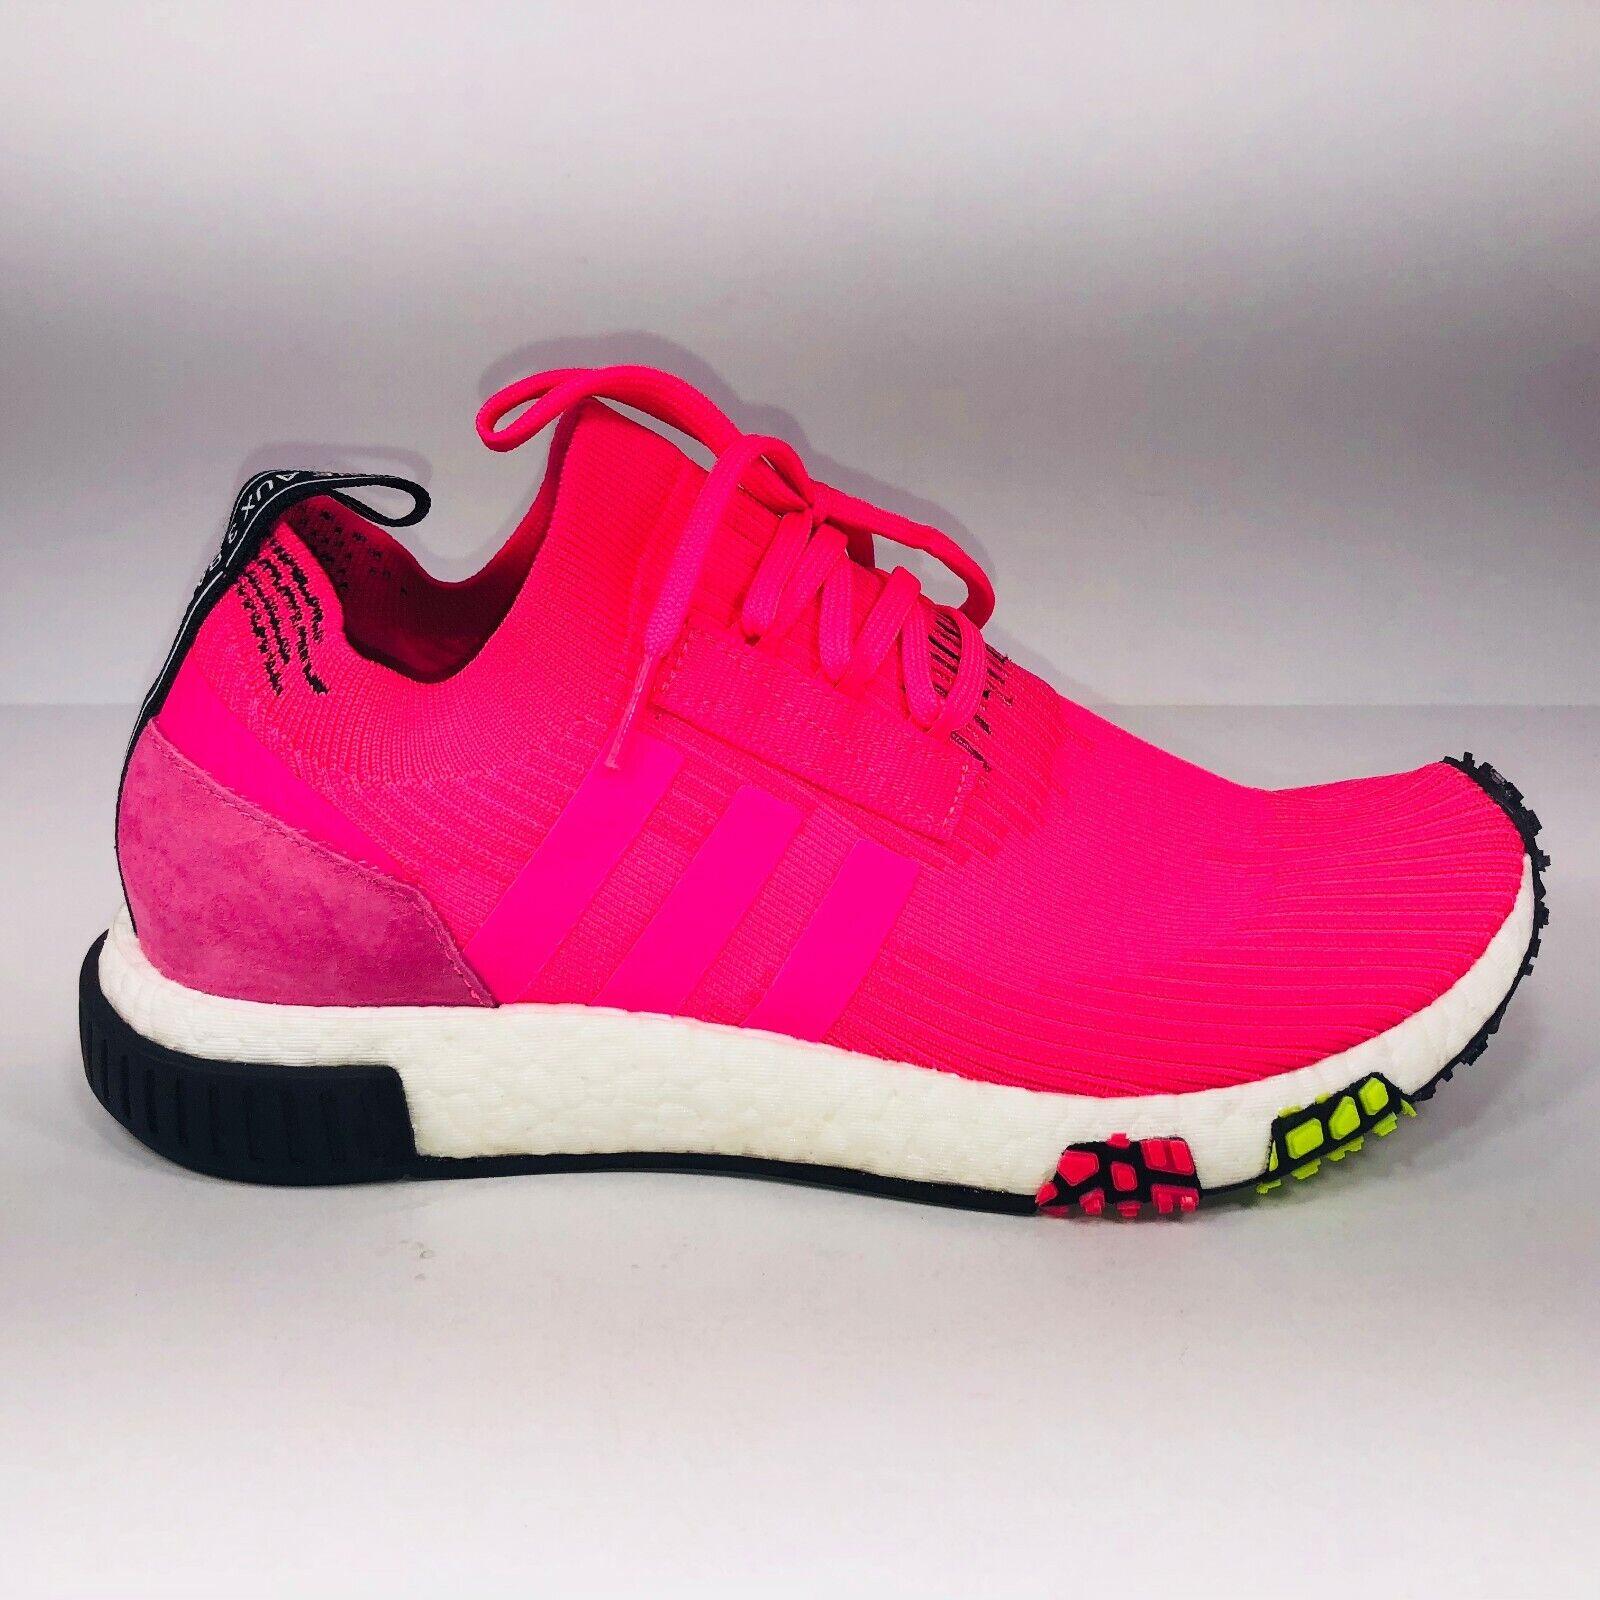 Adidas NMD_Racer Primeknit Solar Pink White Black Athletic Sneaker CQ2442 Size 9